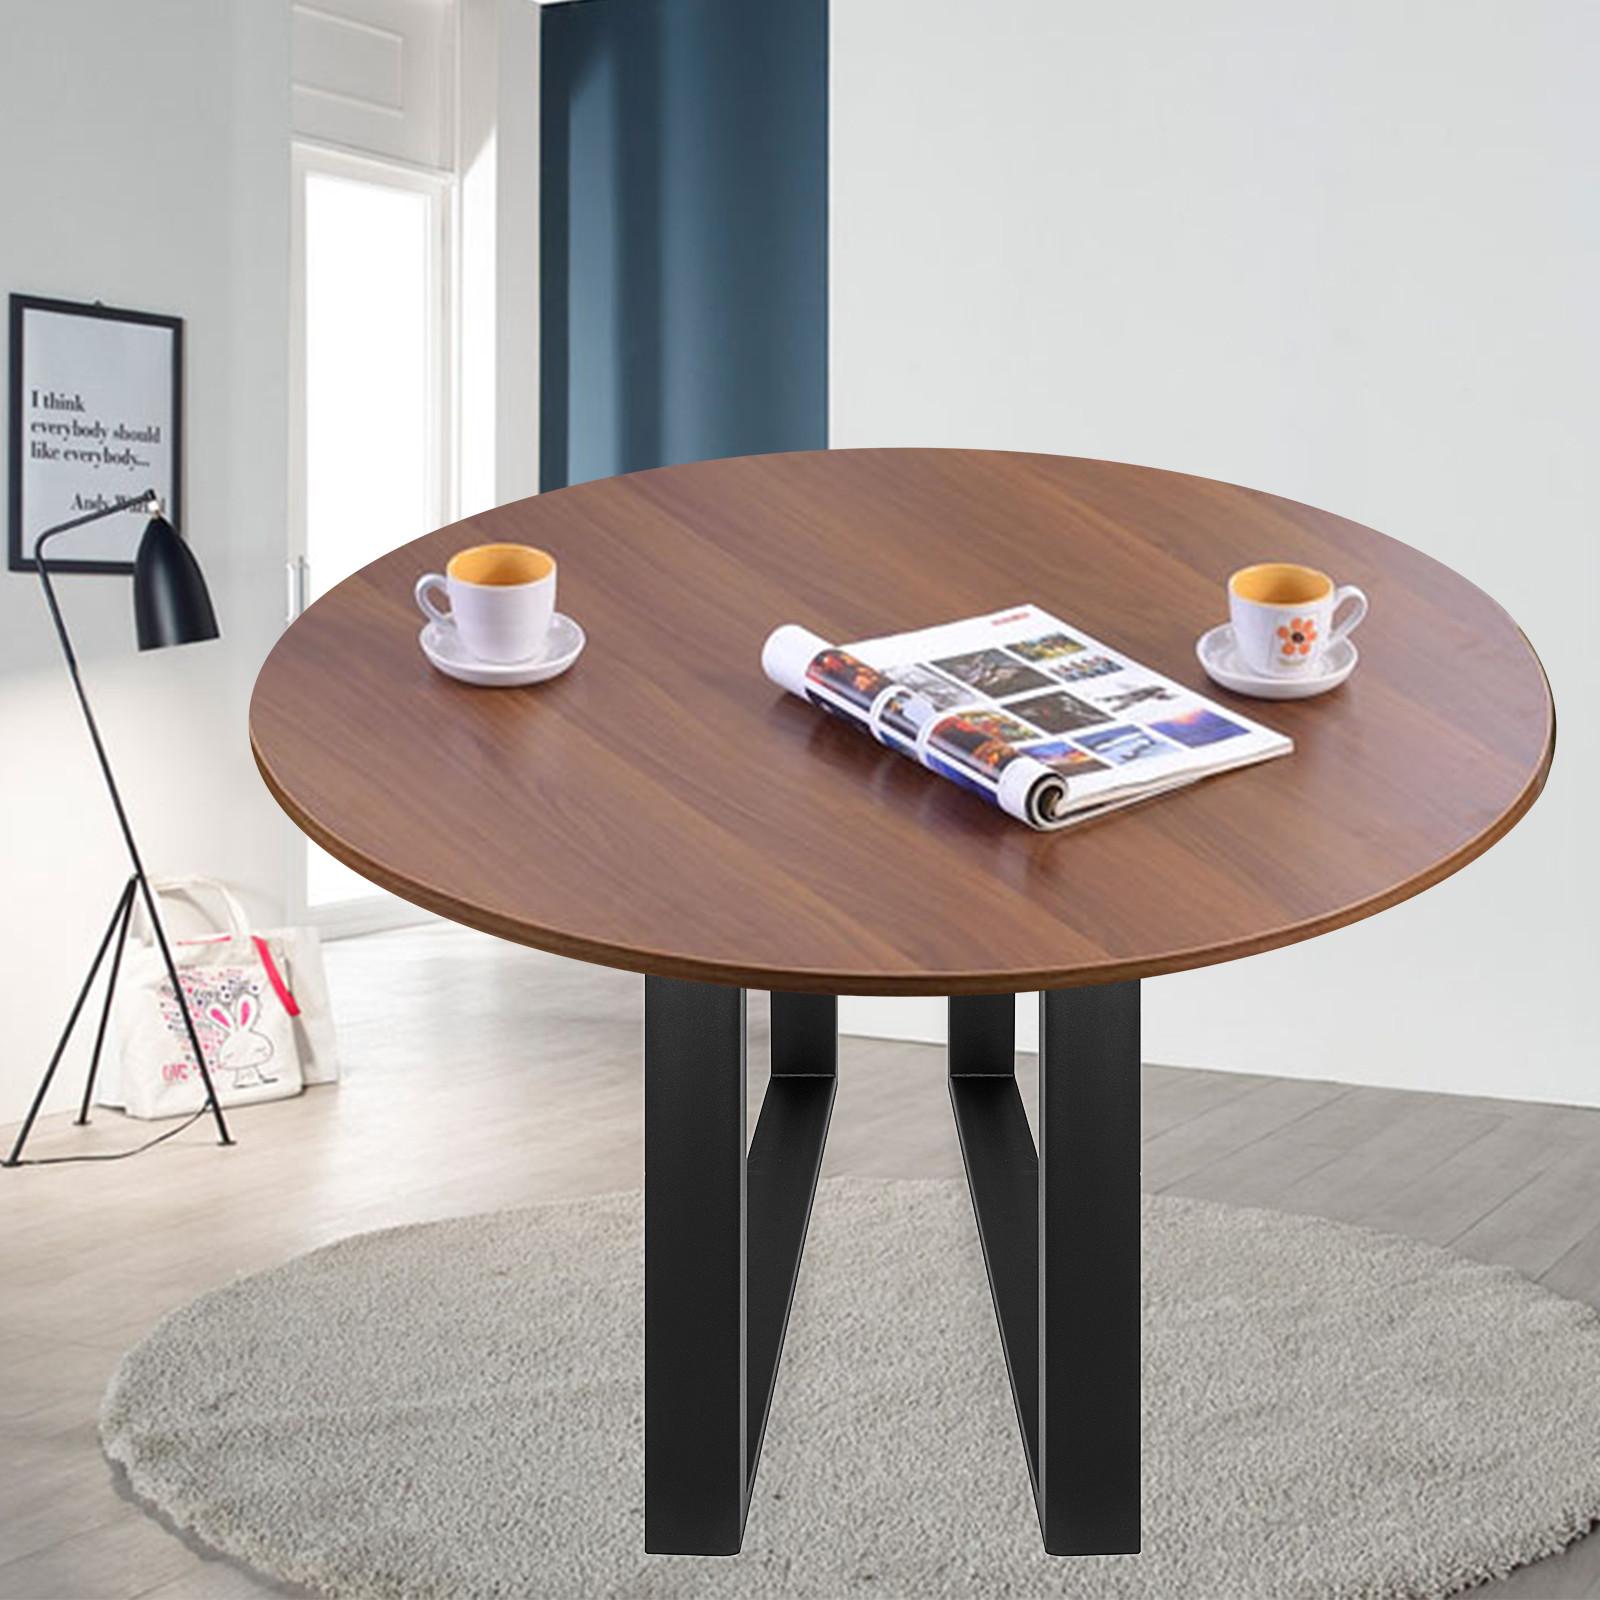 Detalles de 2x Patas de Mesa O Design Patas de Metal Pie Diseño Mesa de  Cocina Negro